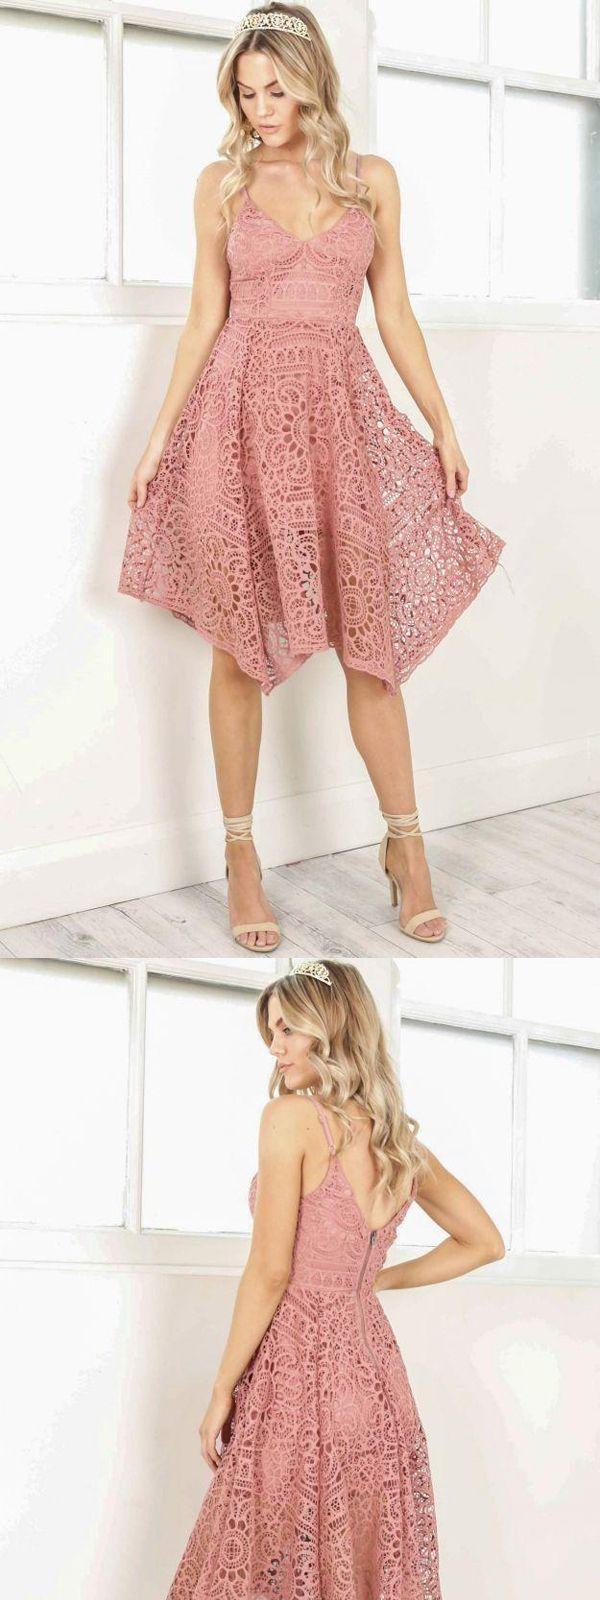 Cheap v neck short cute lace homecoming dresses cm cheap v